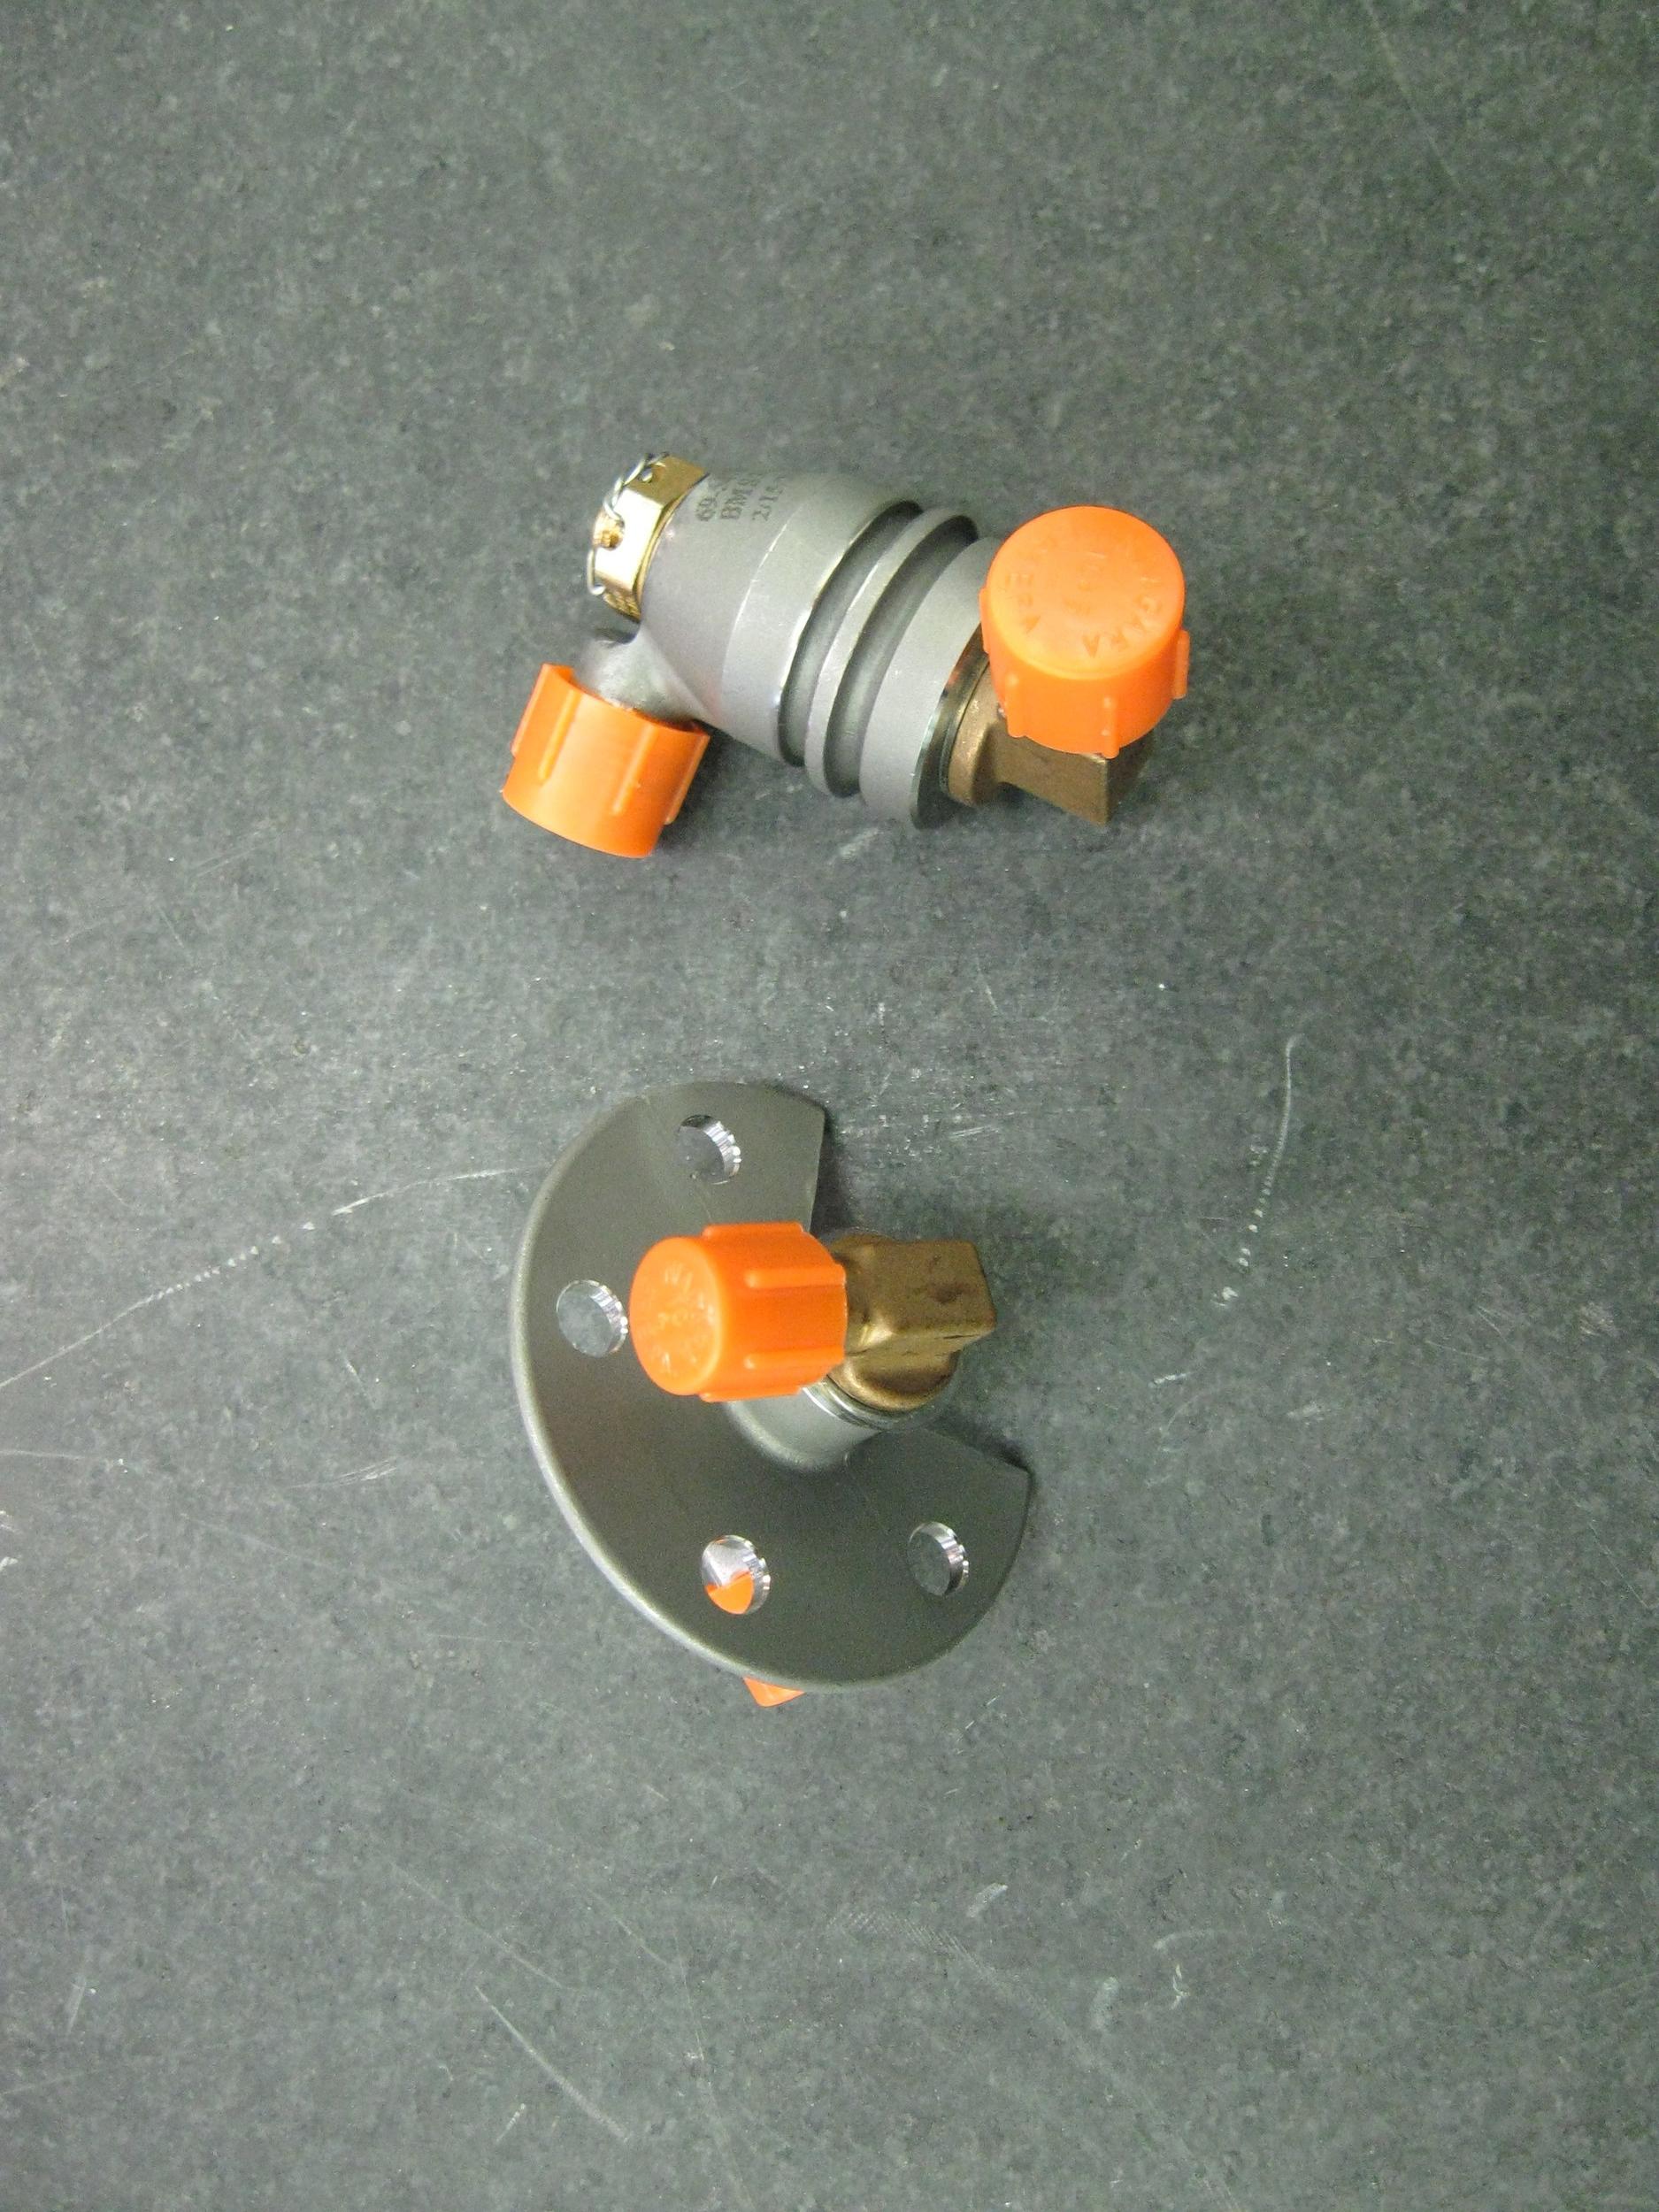 Hydraulic Swivel Assemblies - Spares